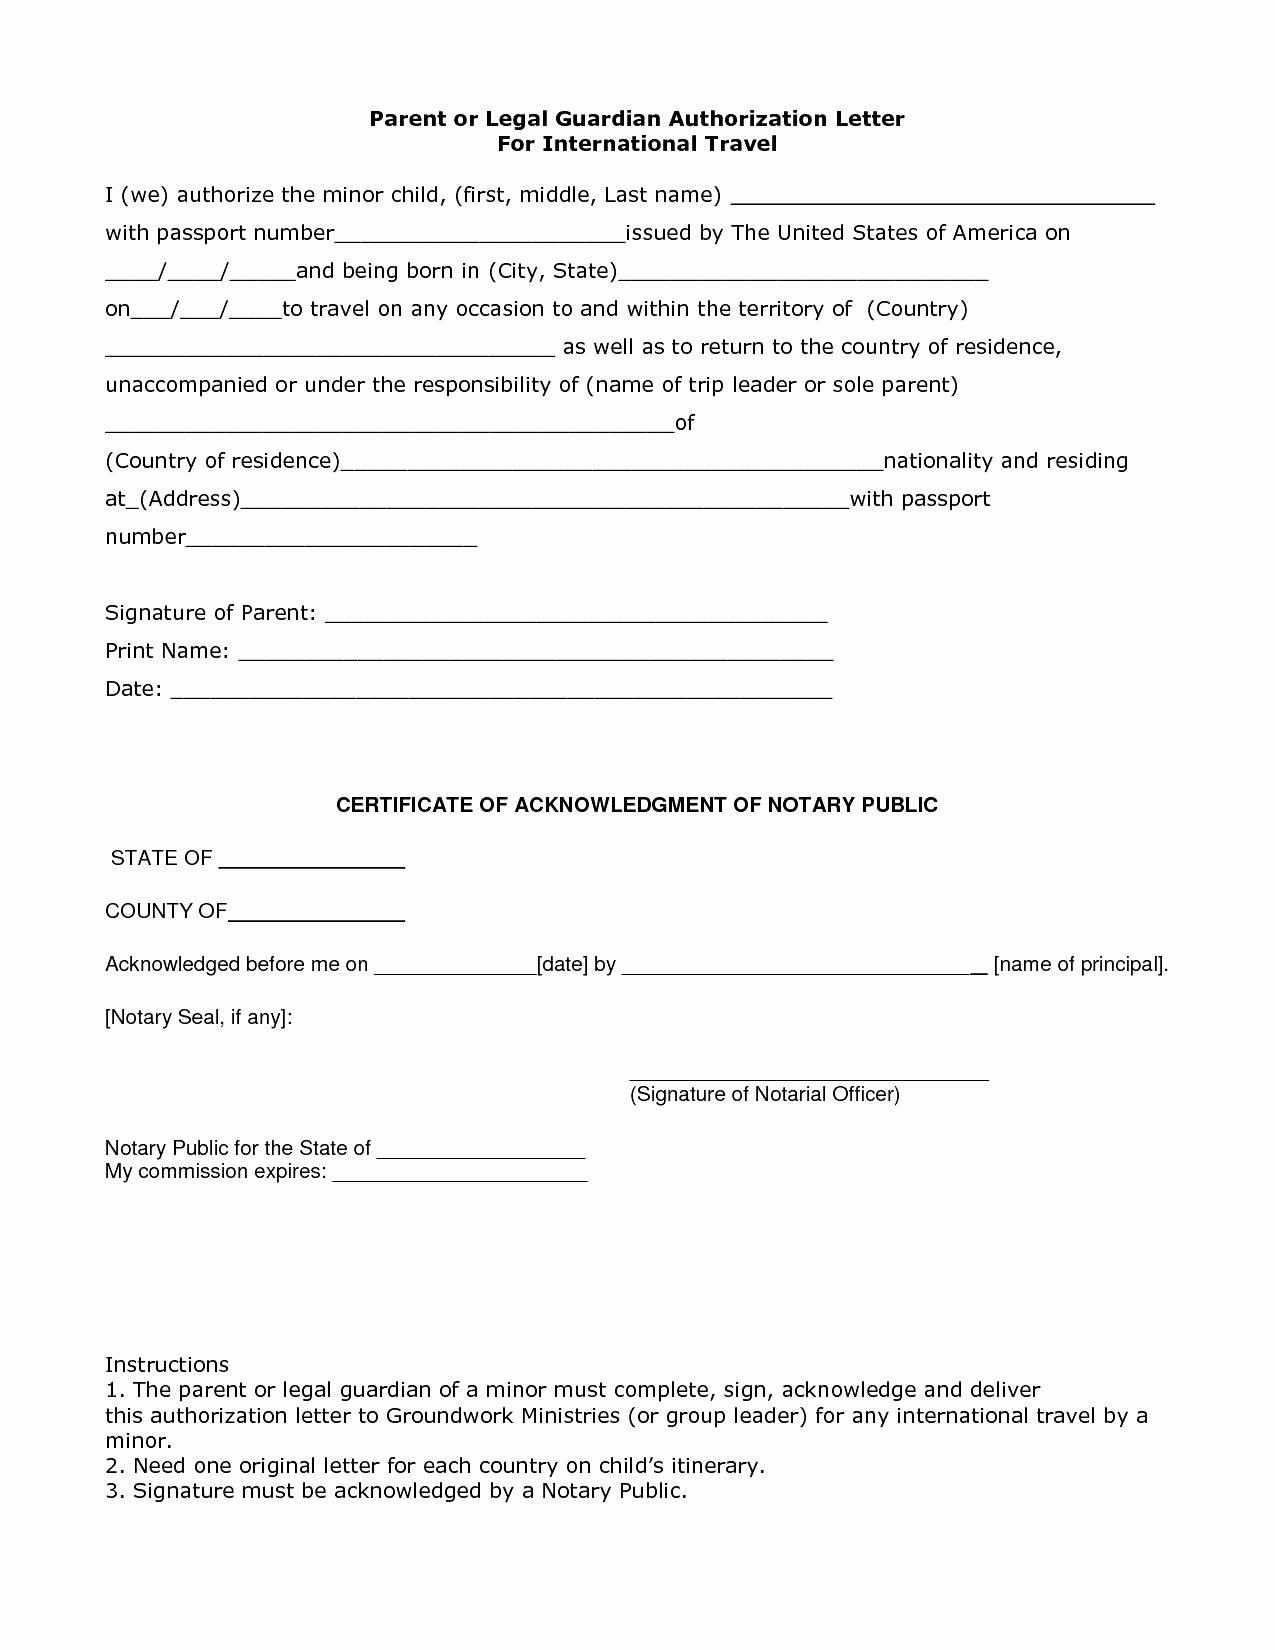 Notarized Custody Agreement Template Best Of Custody and Child Support Agreement Template Beautiful